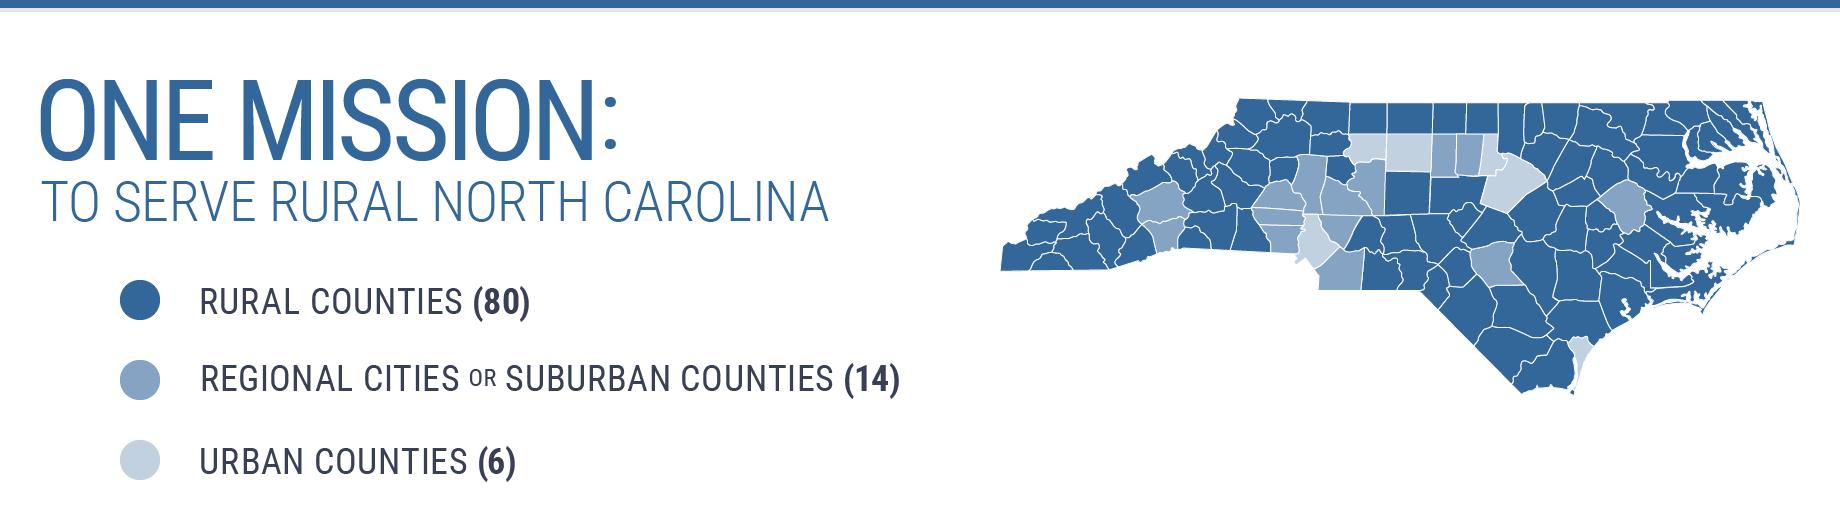 One mission: To serve Rural North Carolina